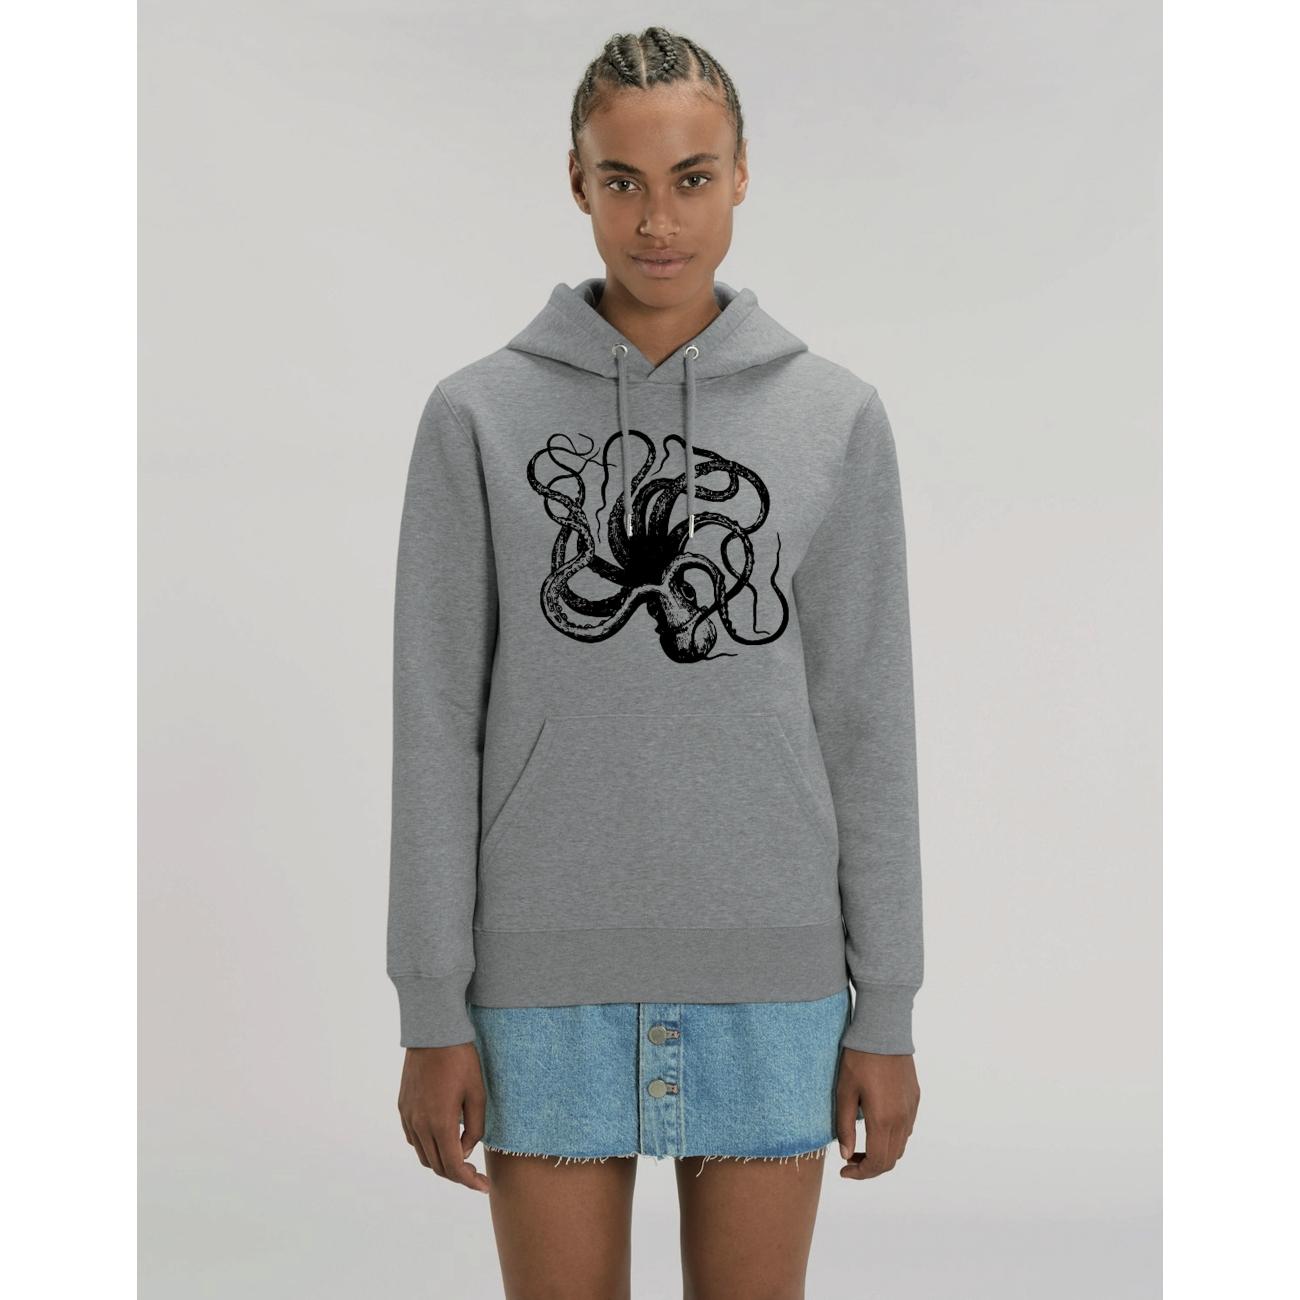 https://tee-shirt-bio.com/10399-thickbox_default/sweat-capuche-femme-coton-bio-gris-chine-impression-poulpe.jpg